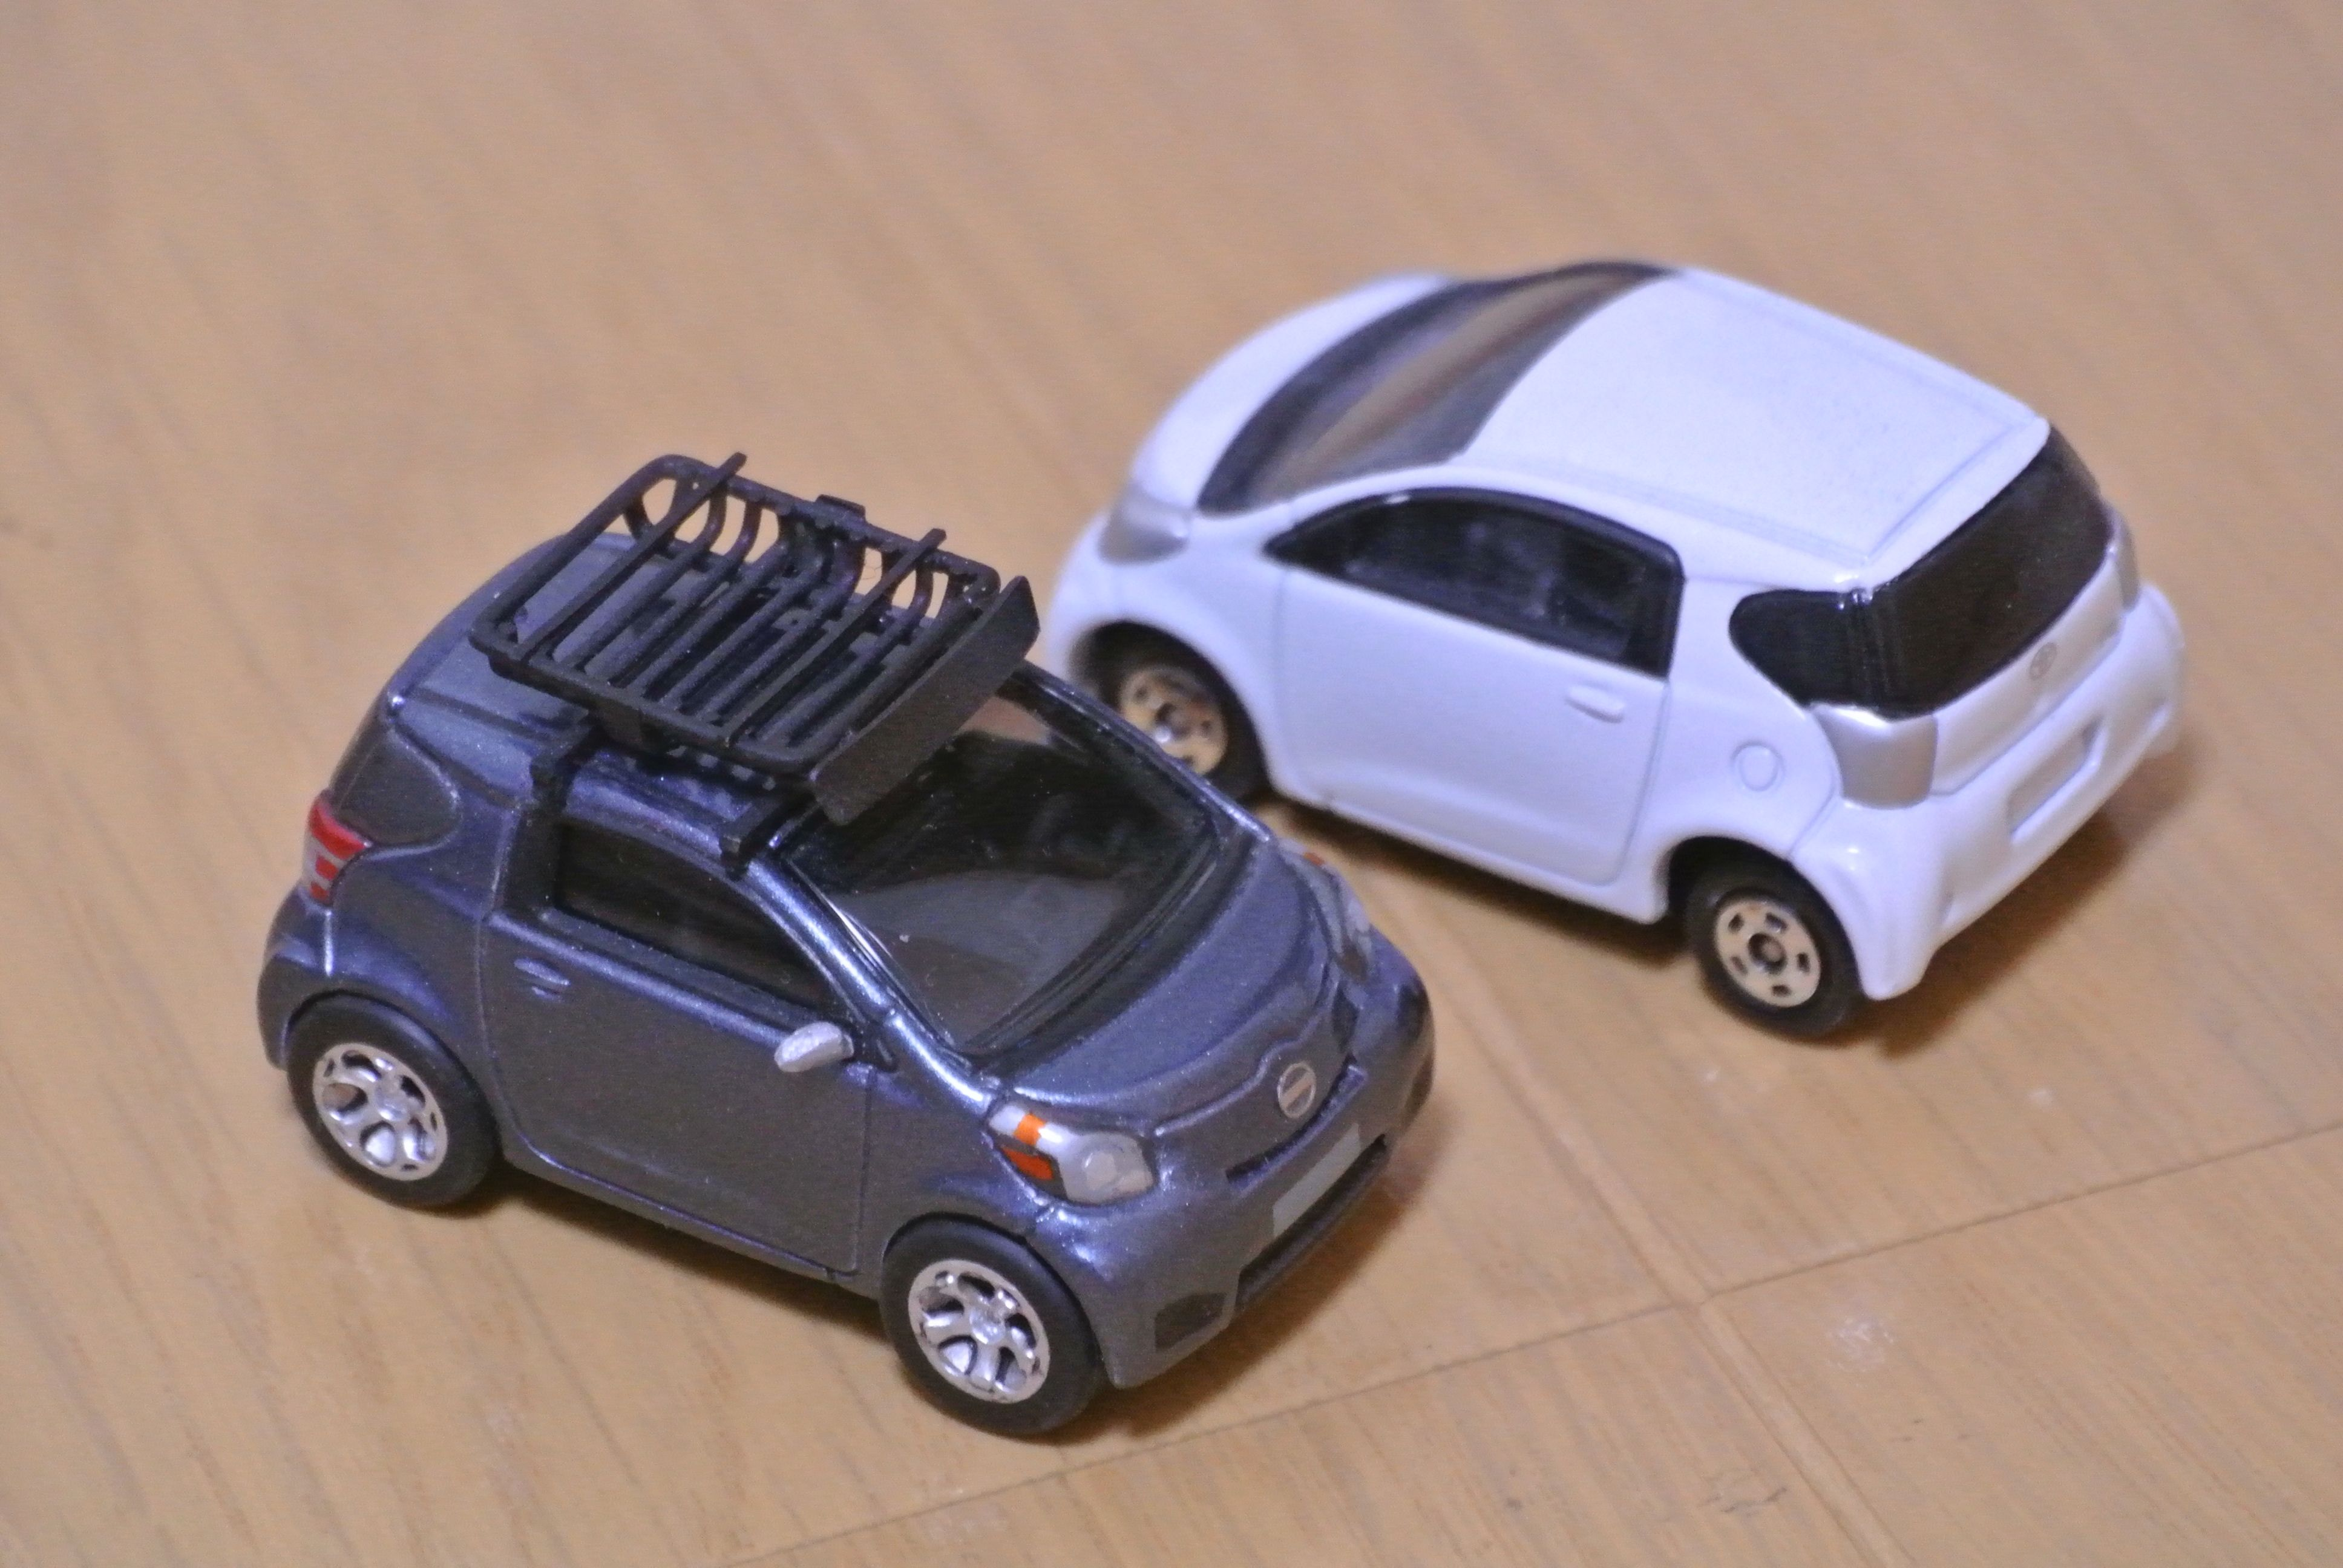 Tomica Toyota Iq 1 60 Small Cars Custom Toys Hot Wheels